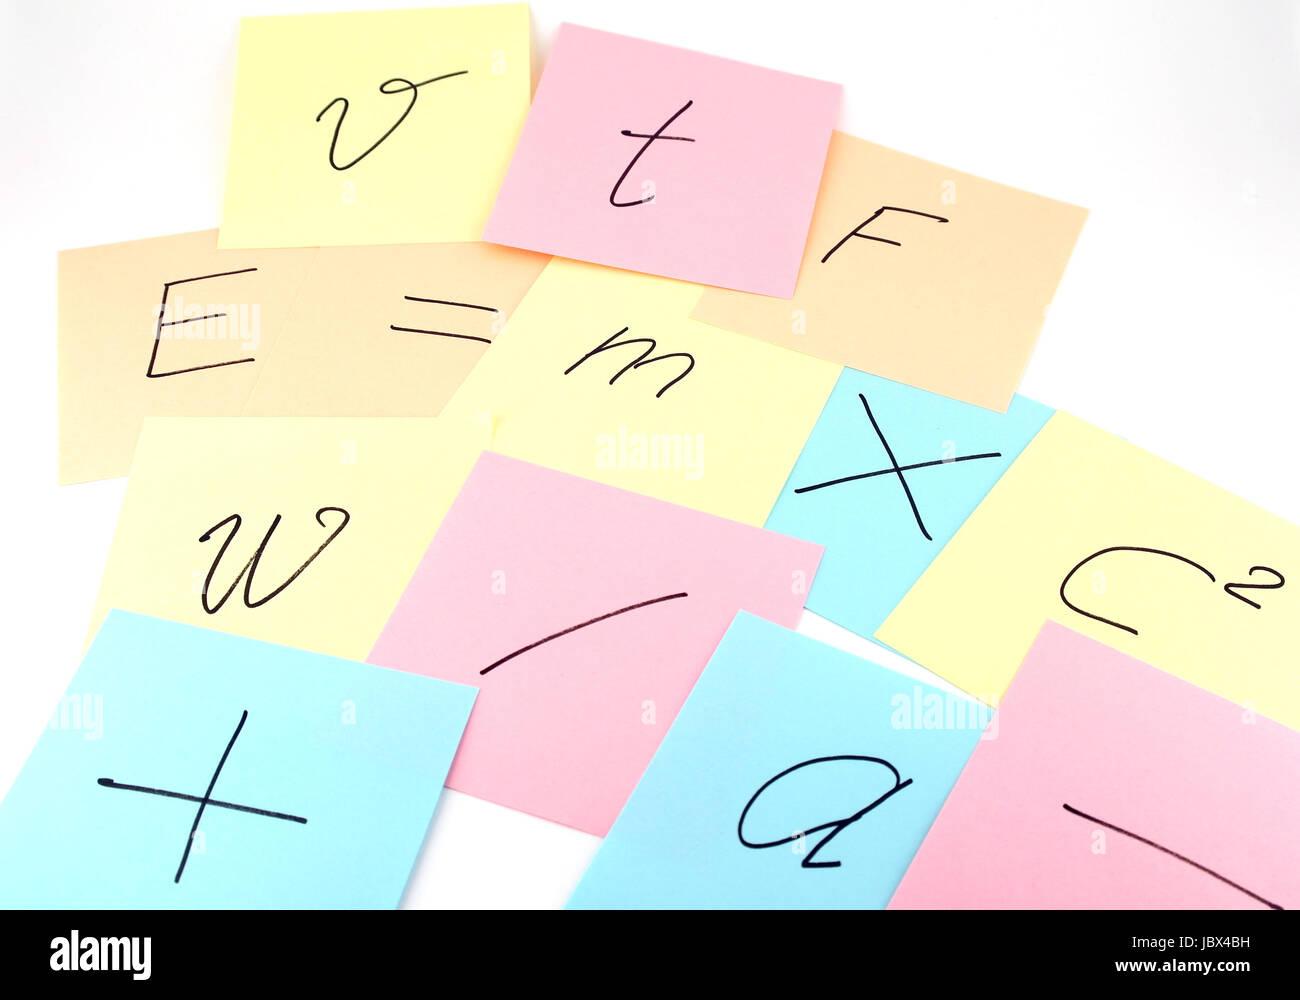 Reminder Notes Scientific Symbols Physics Stock Photos Reminder